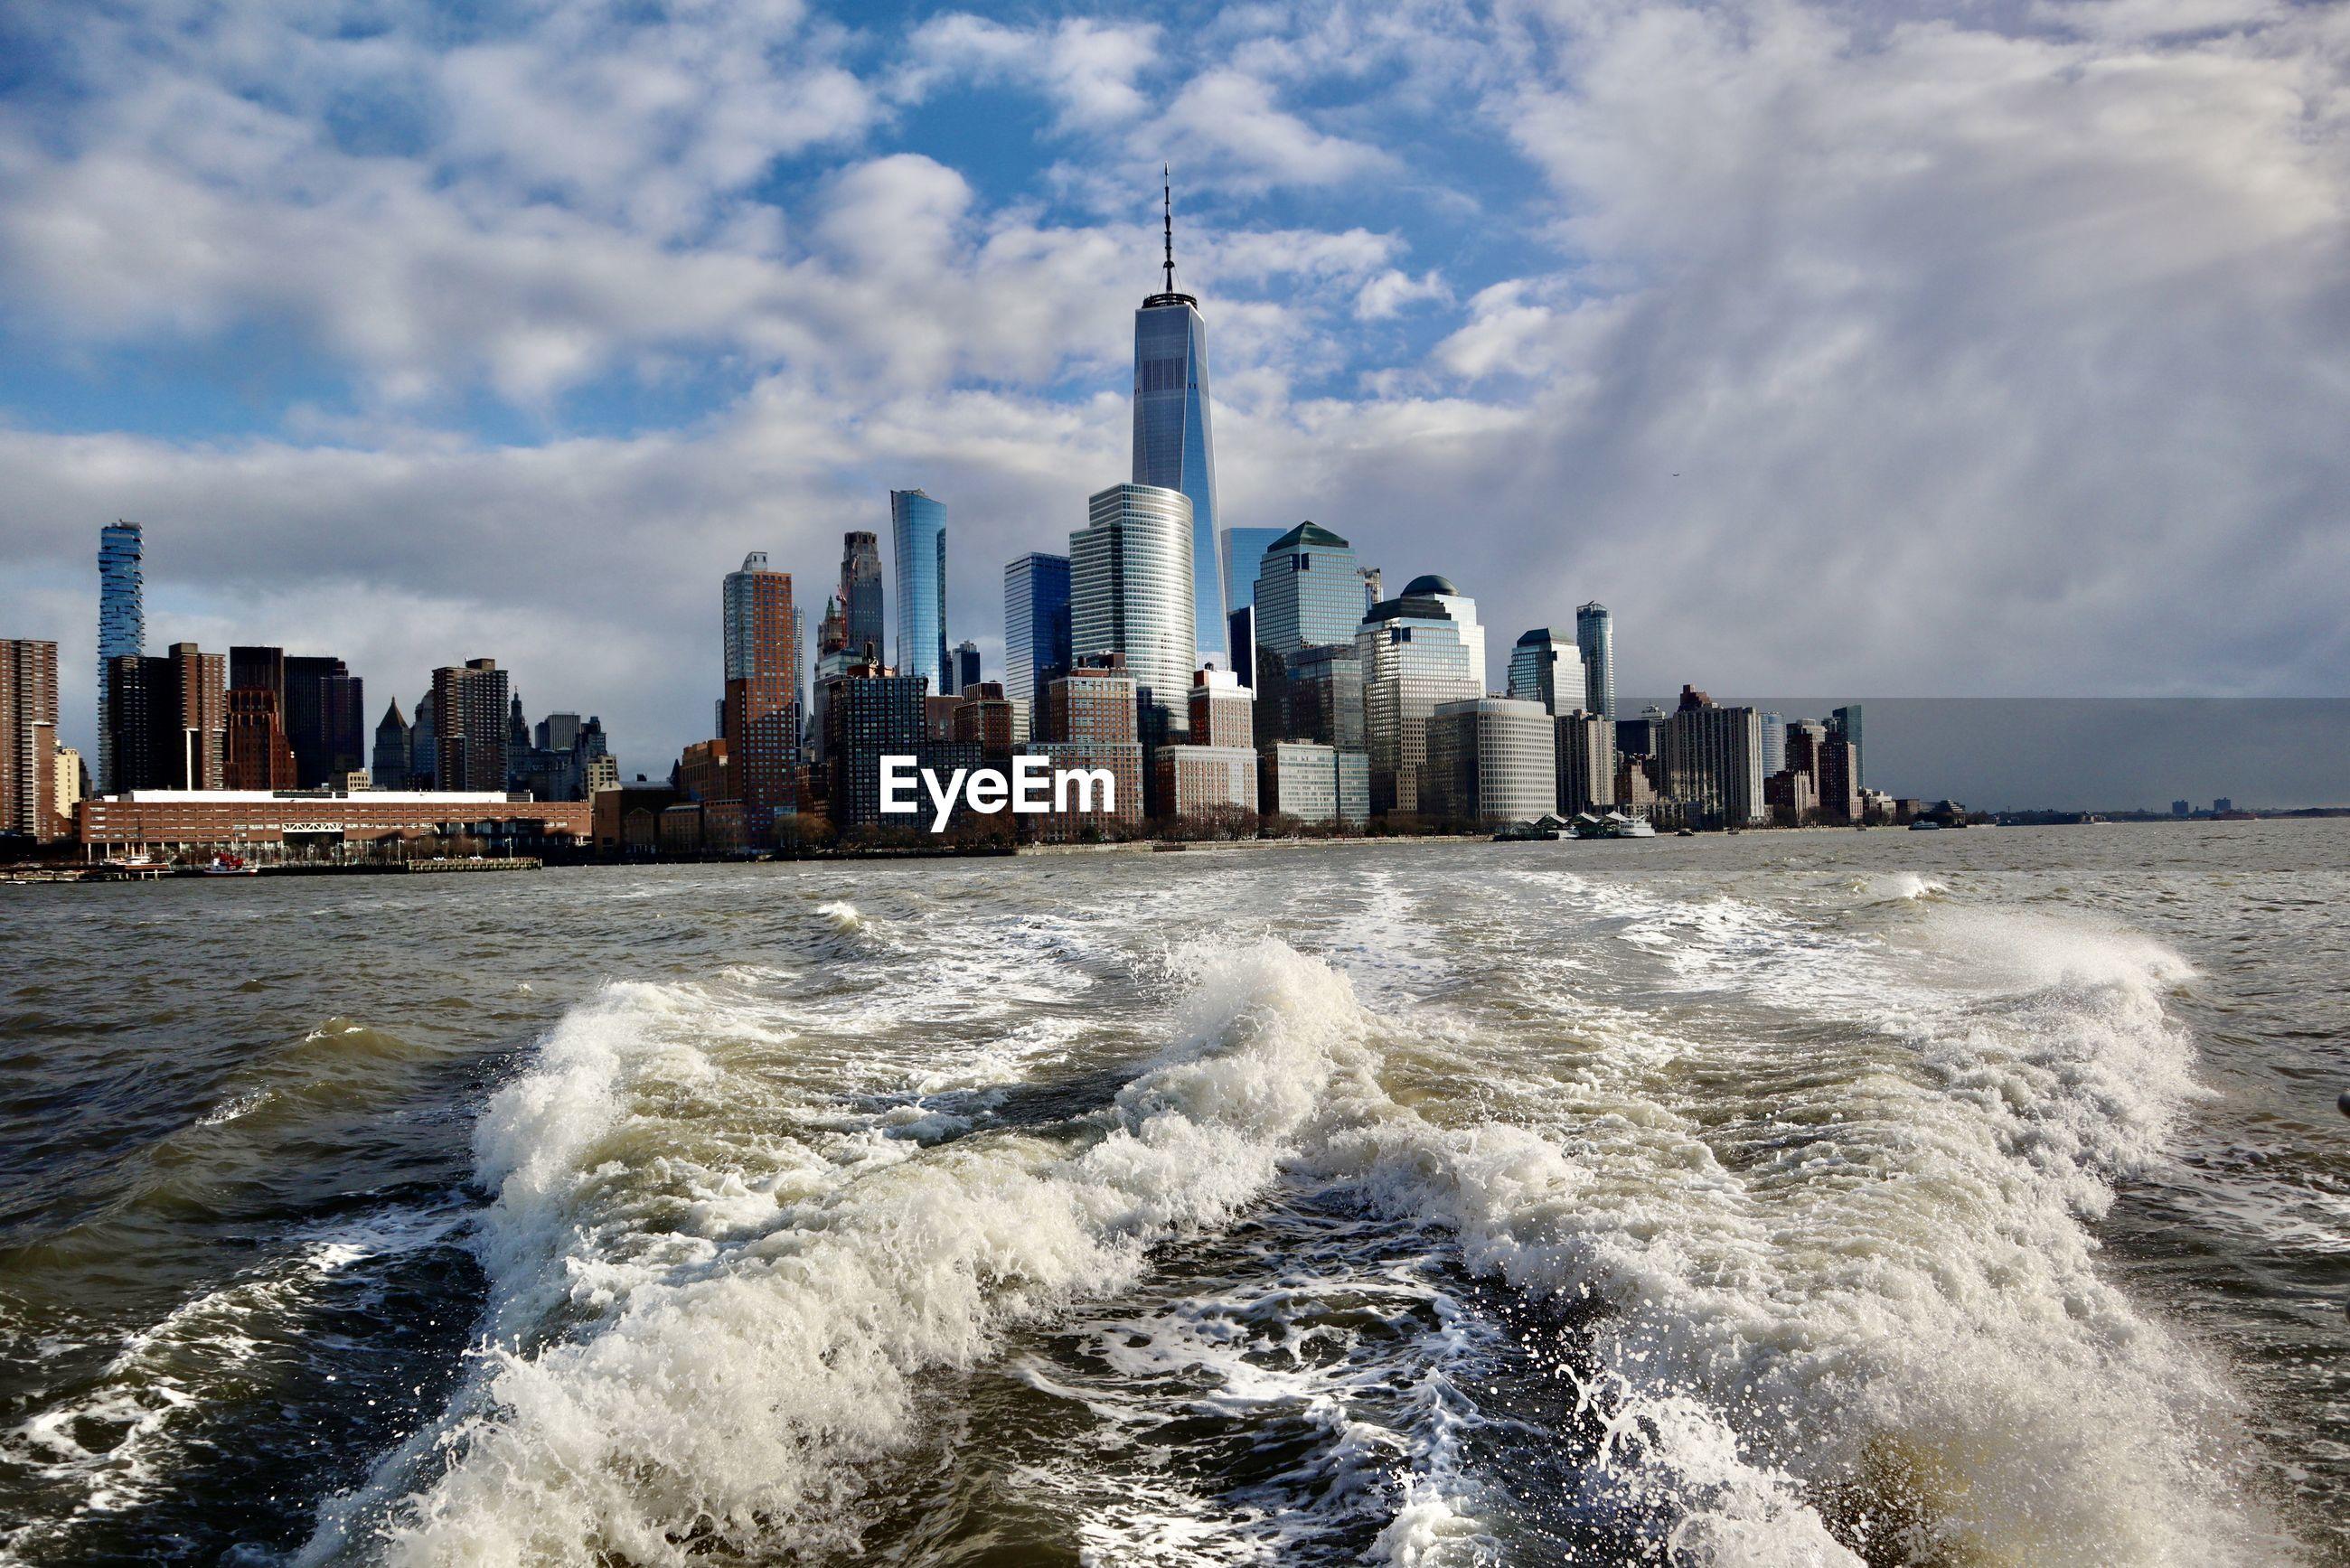 PANORAMIC SHOT OF SEA BY BUILDINGS AGAINST SKY